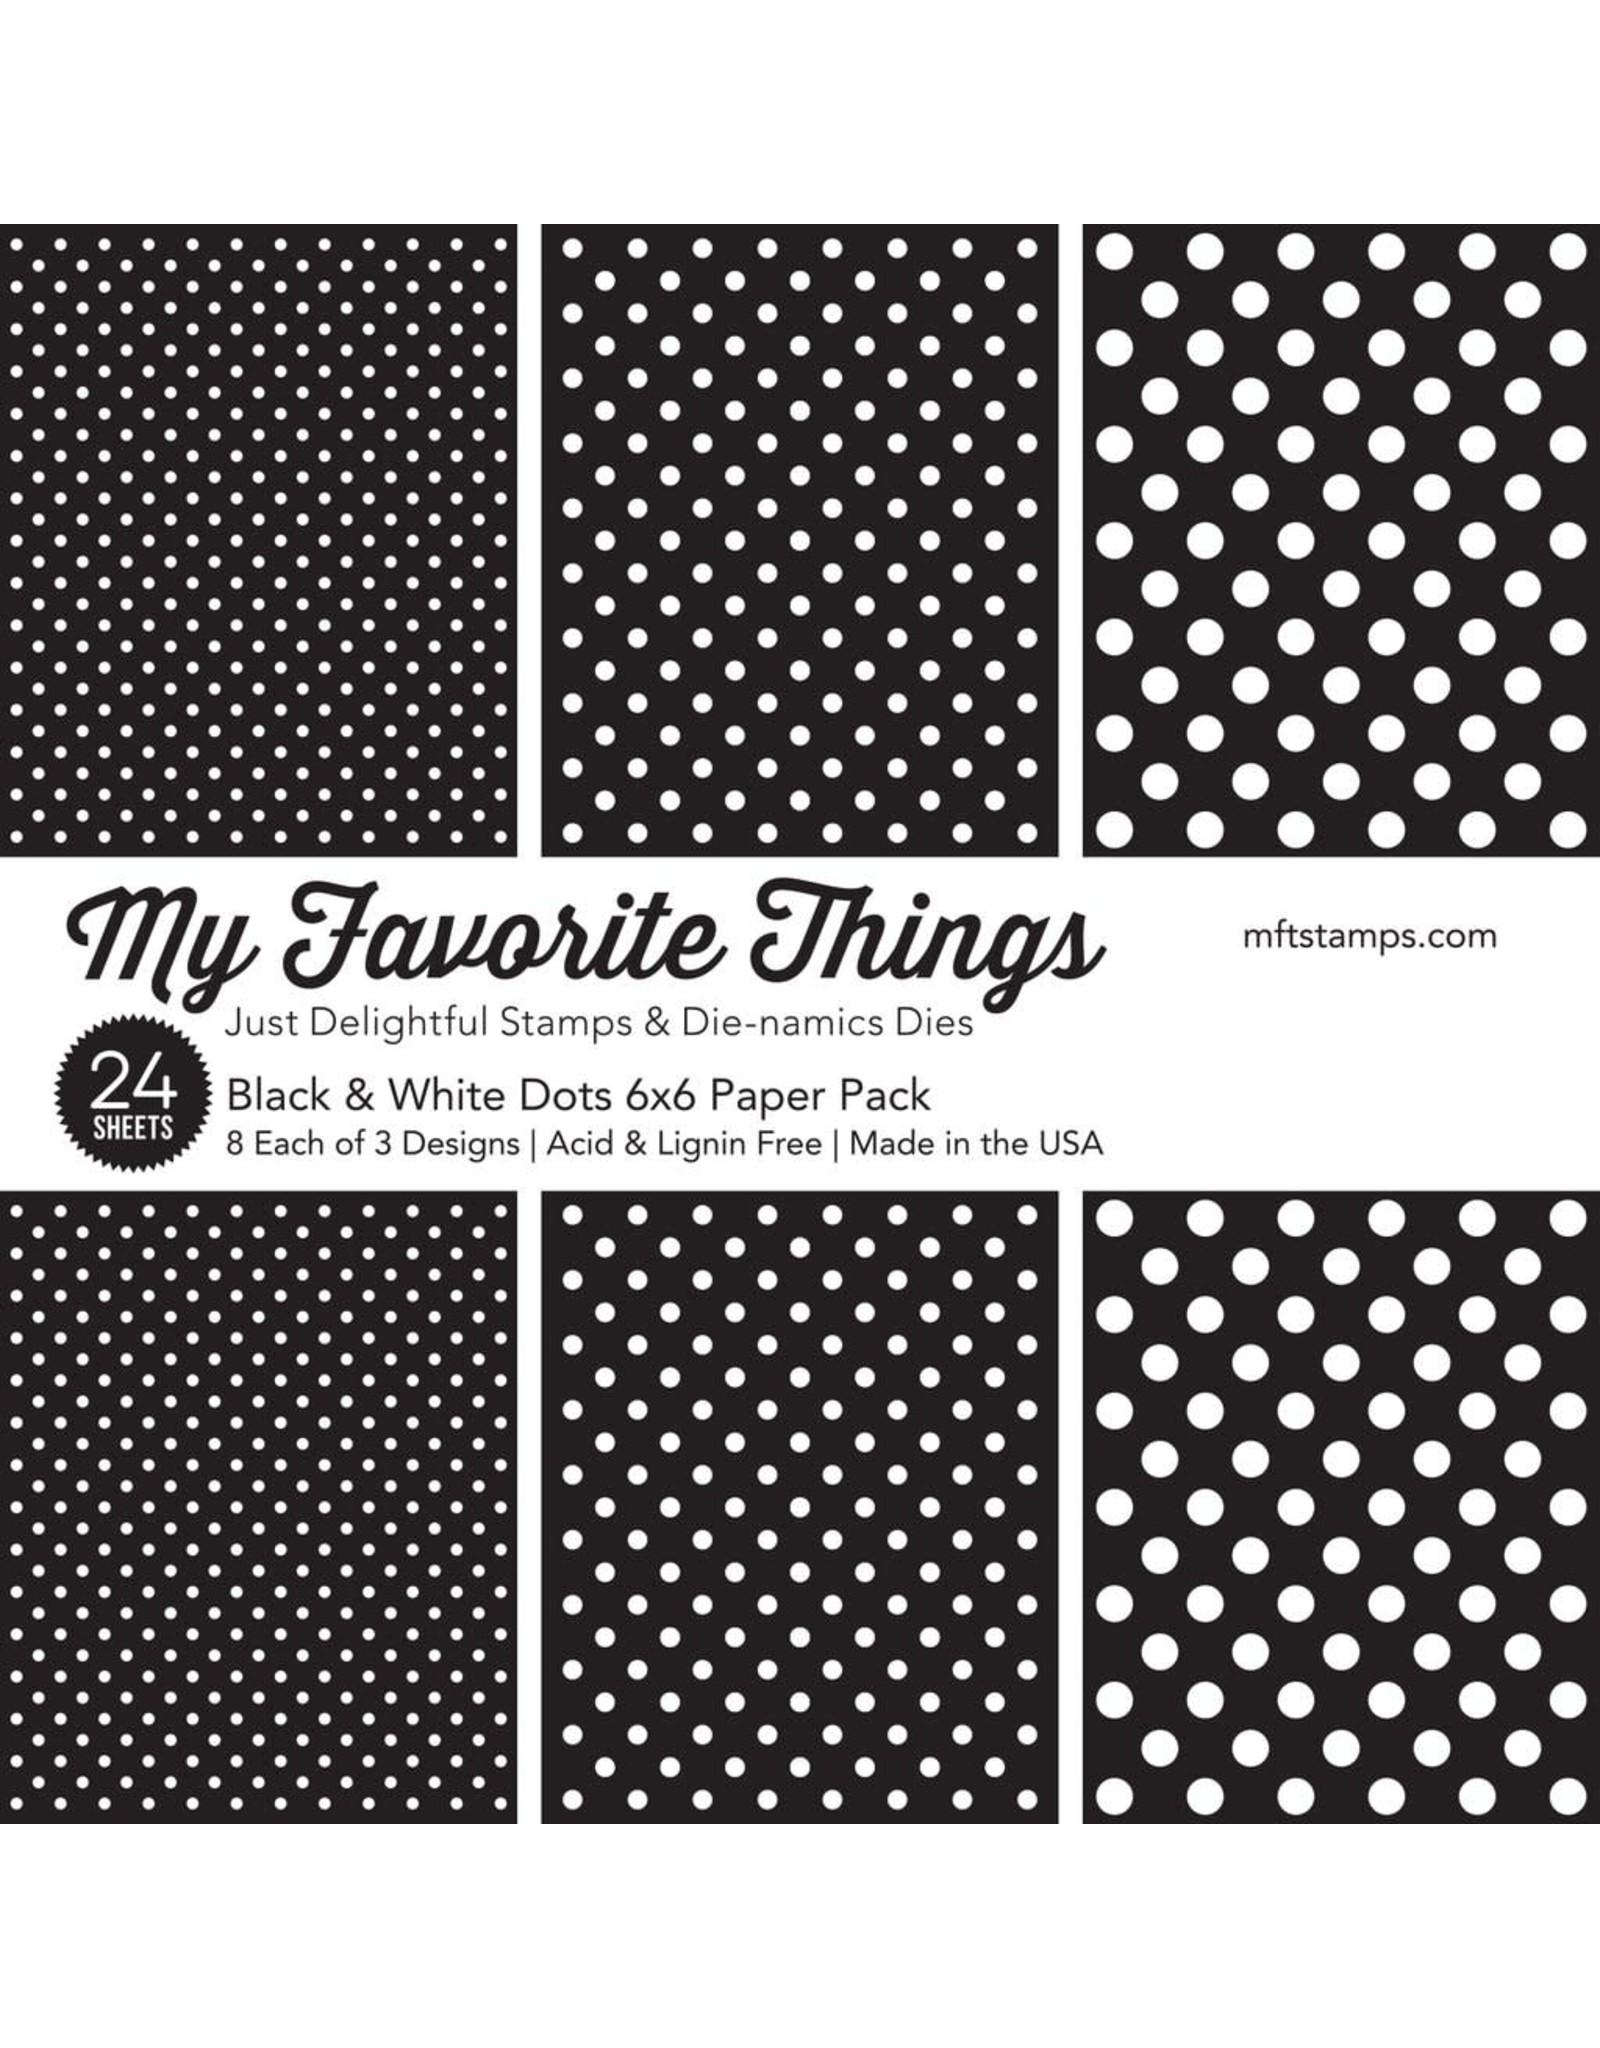 My Favorite Things Black & White Dots Paper Pad